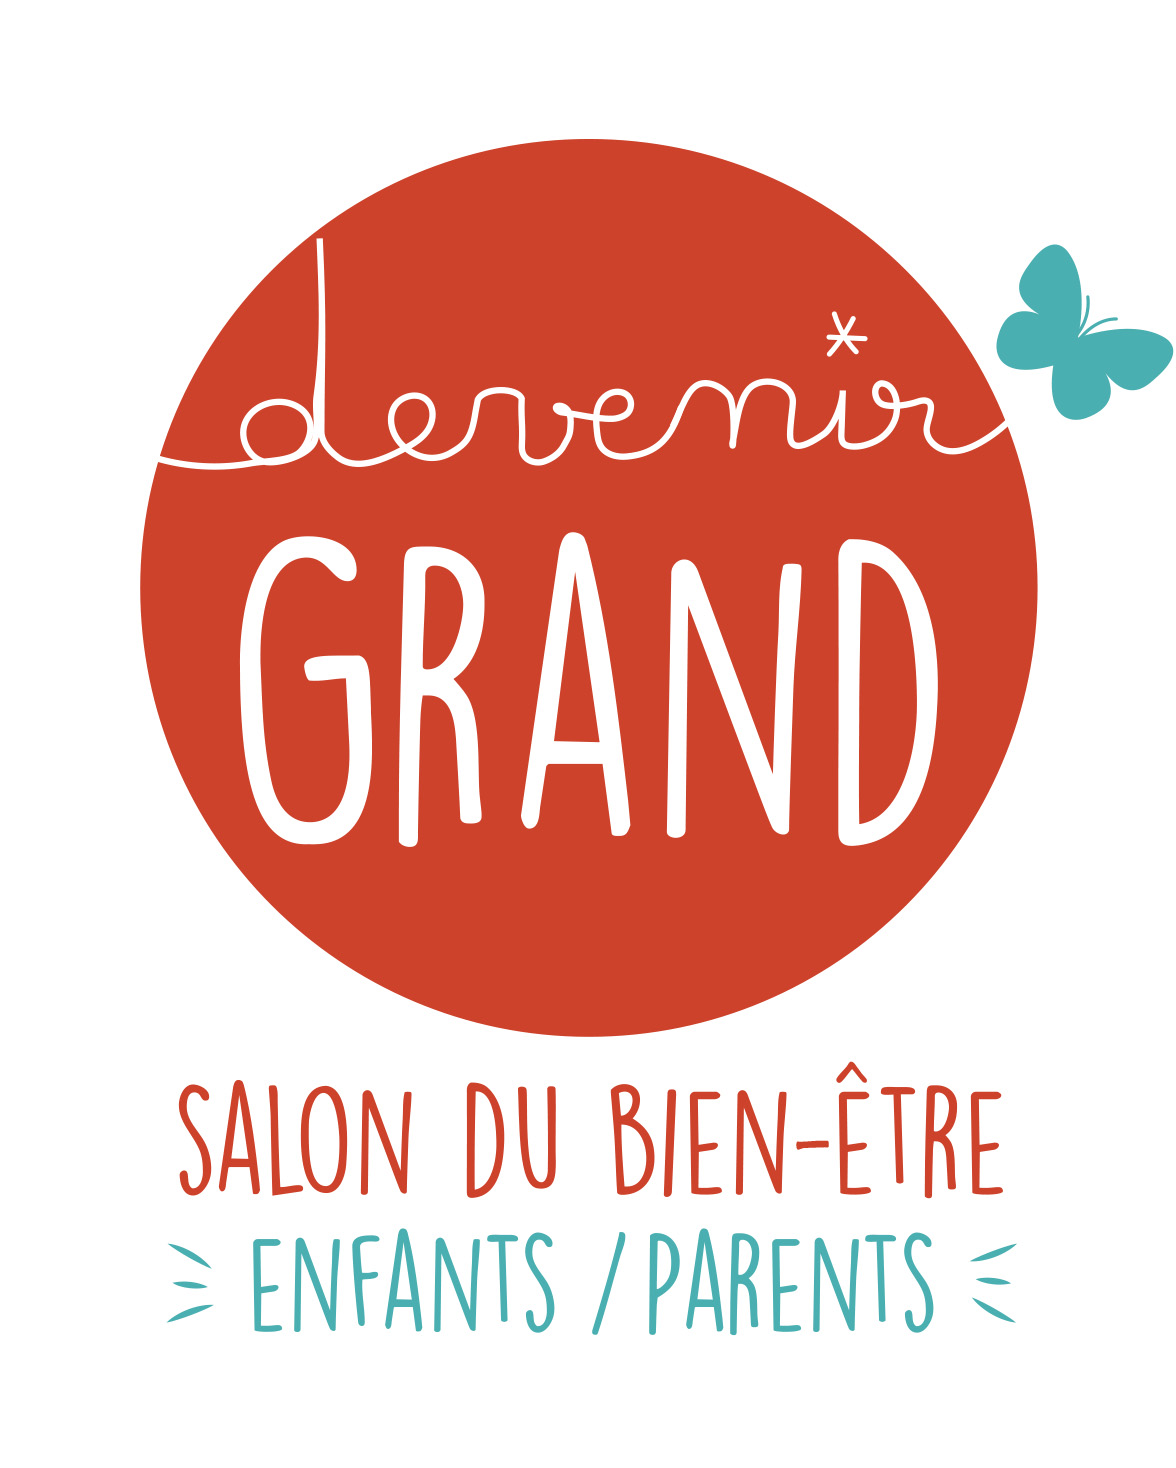 https://www.facebook.com/salondevenirgrand?utm_source=sendinblue&utm_campaign=LE_BULLETIN_DE_LAMANUSA&utm_medium=email